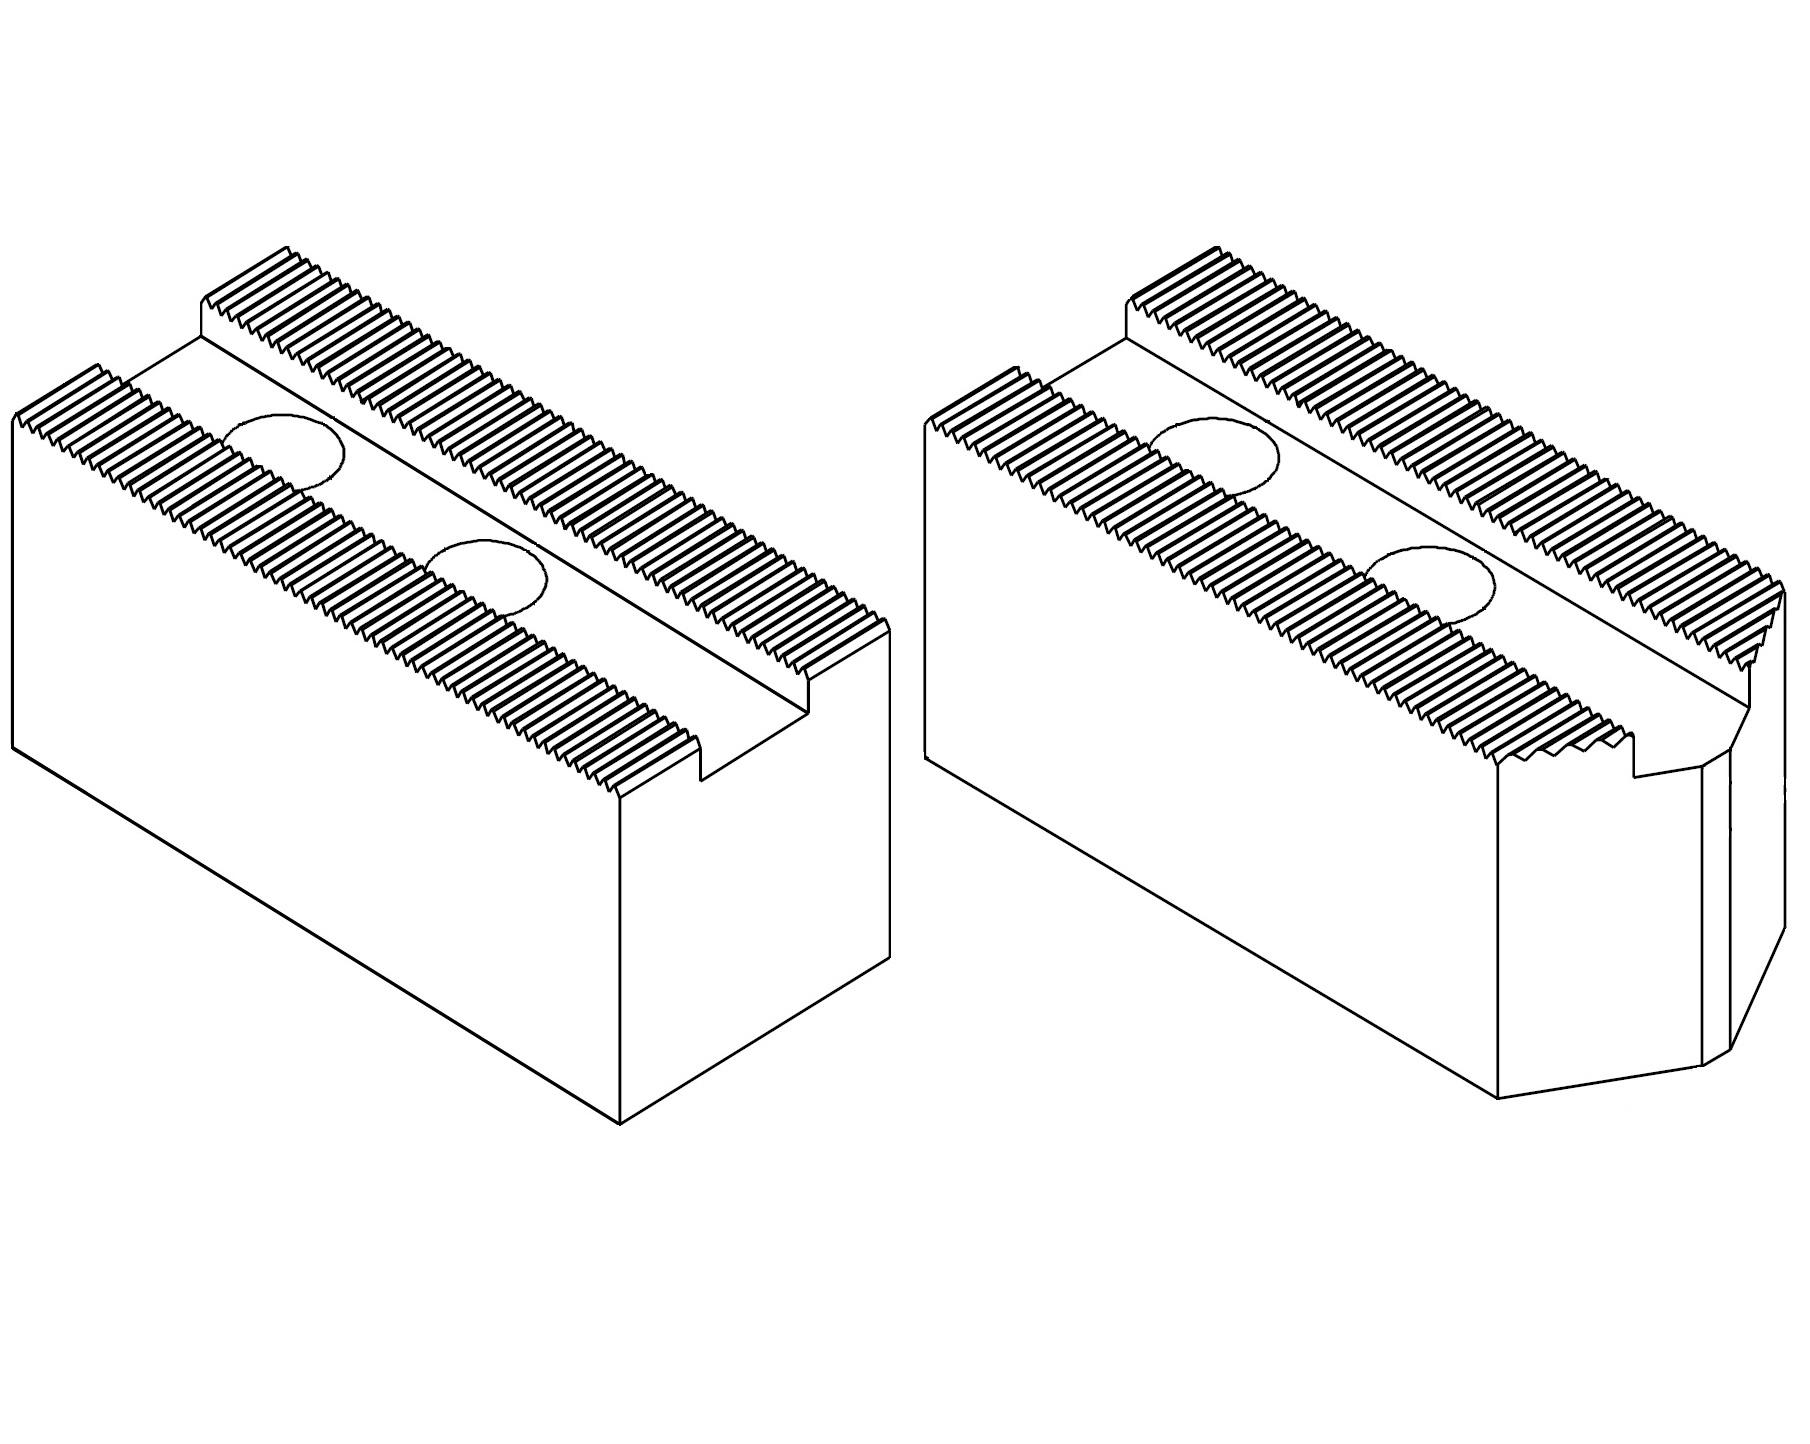 Čelisti měkké 1,5x60°, šířka drážky - 12 (sklíčidla pr. 160-170mm)